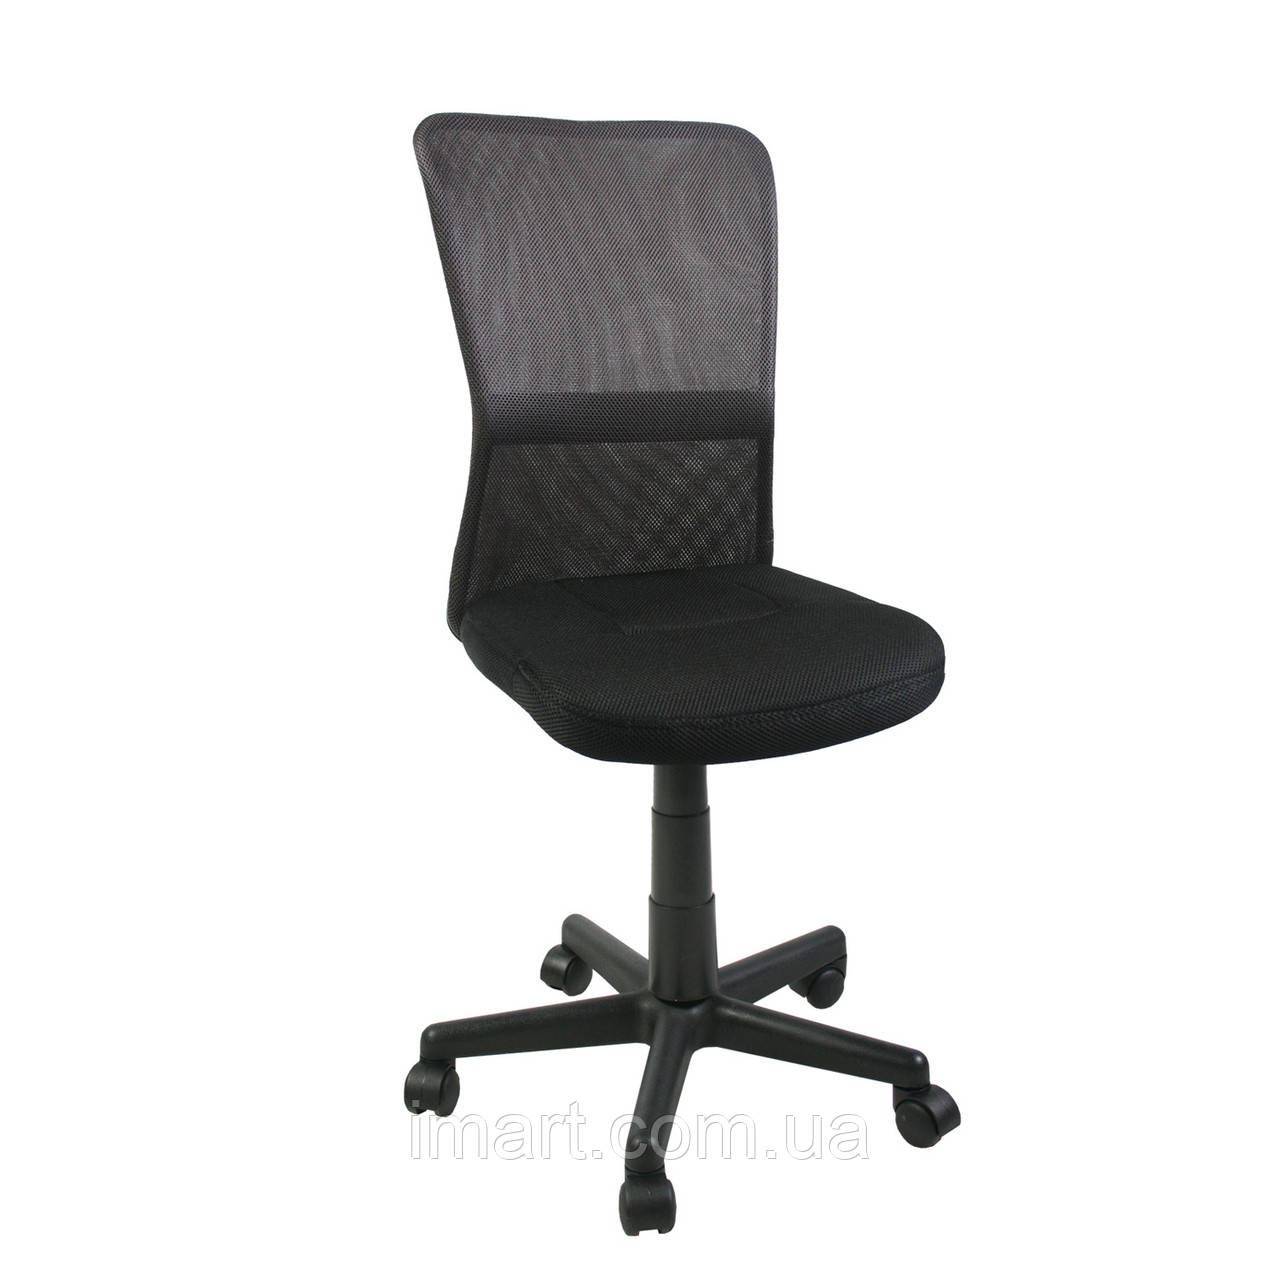 Дитяче комп'ютерне крісло Offce4You BELICE, Black/Grey